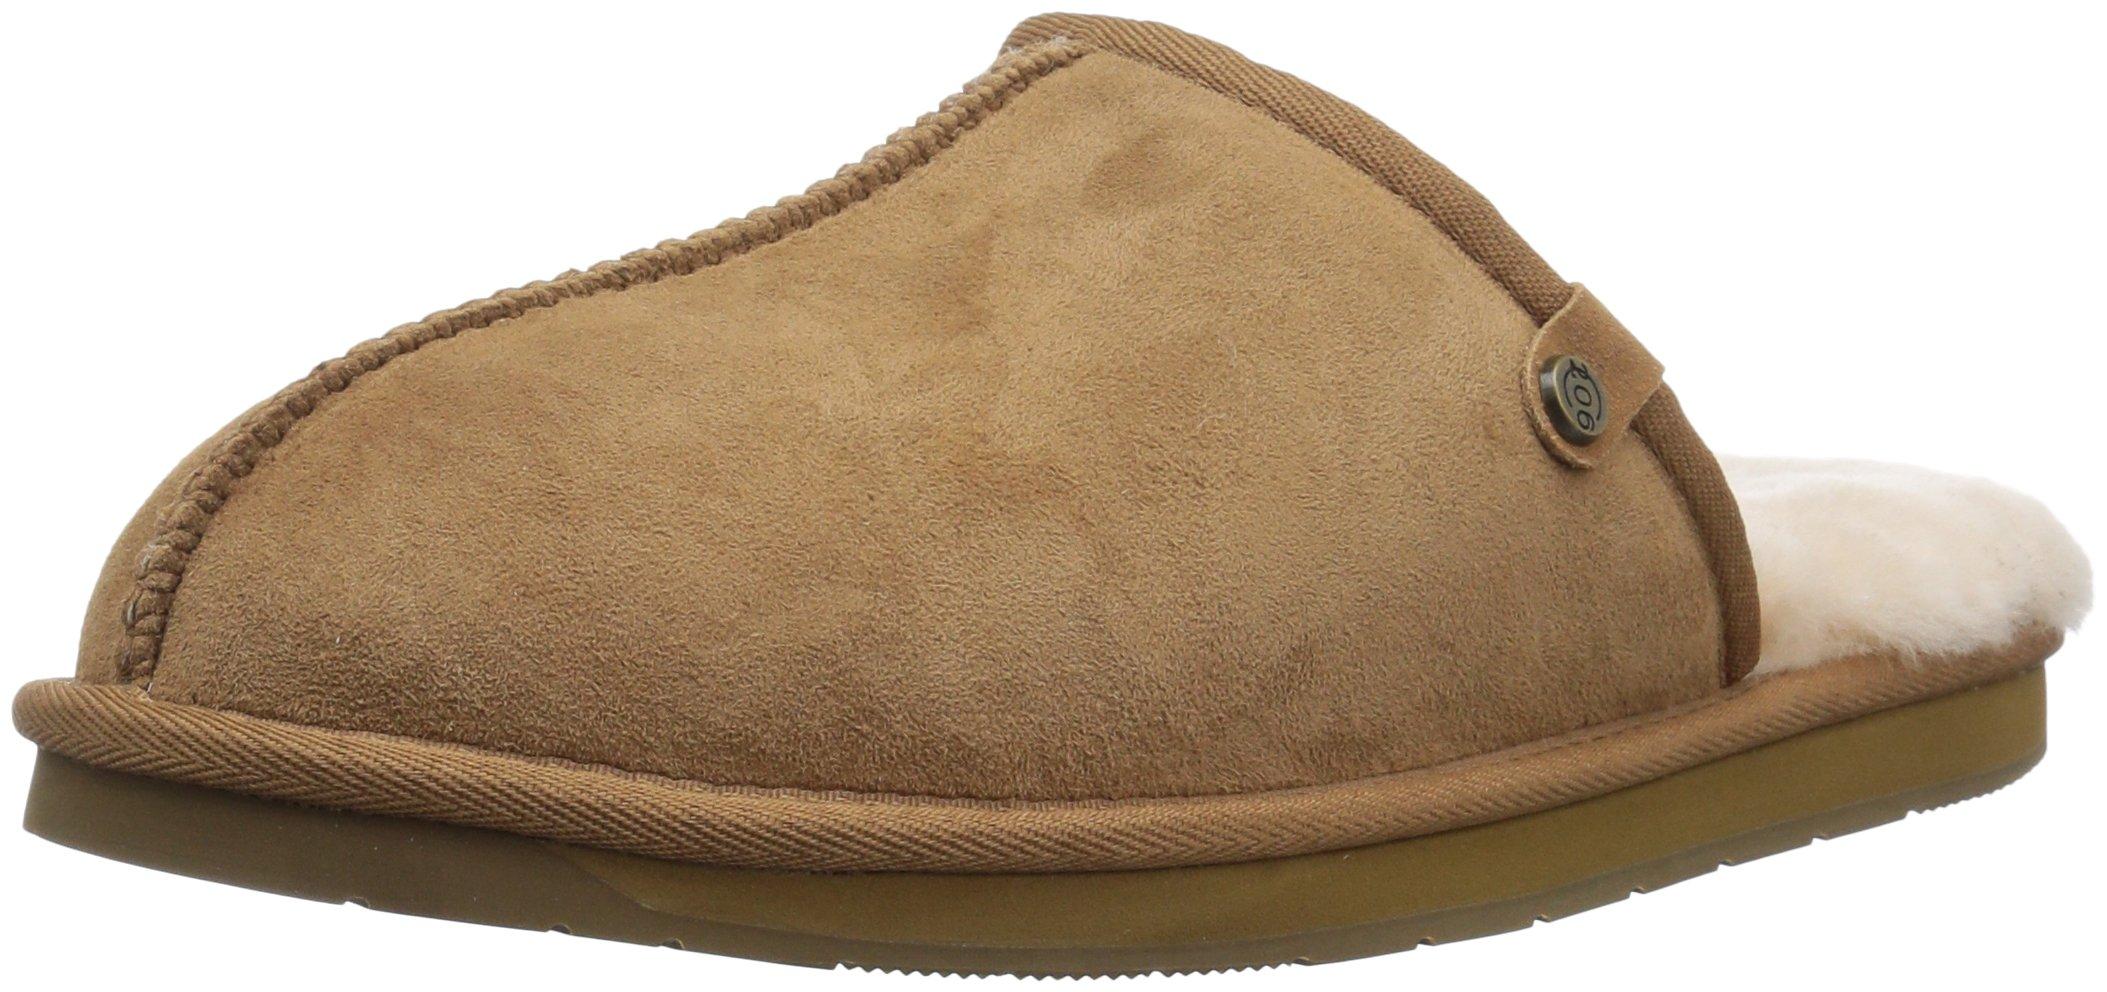 Amazon Brand - 206 Collective Men's Union Shearling Slide Slipper Shoe, chestnut, 12 D US